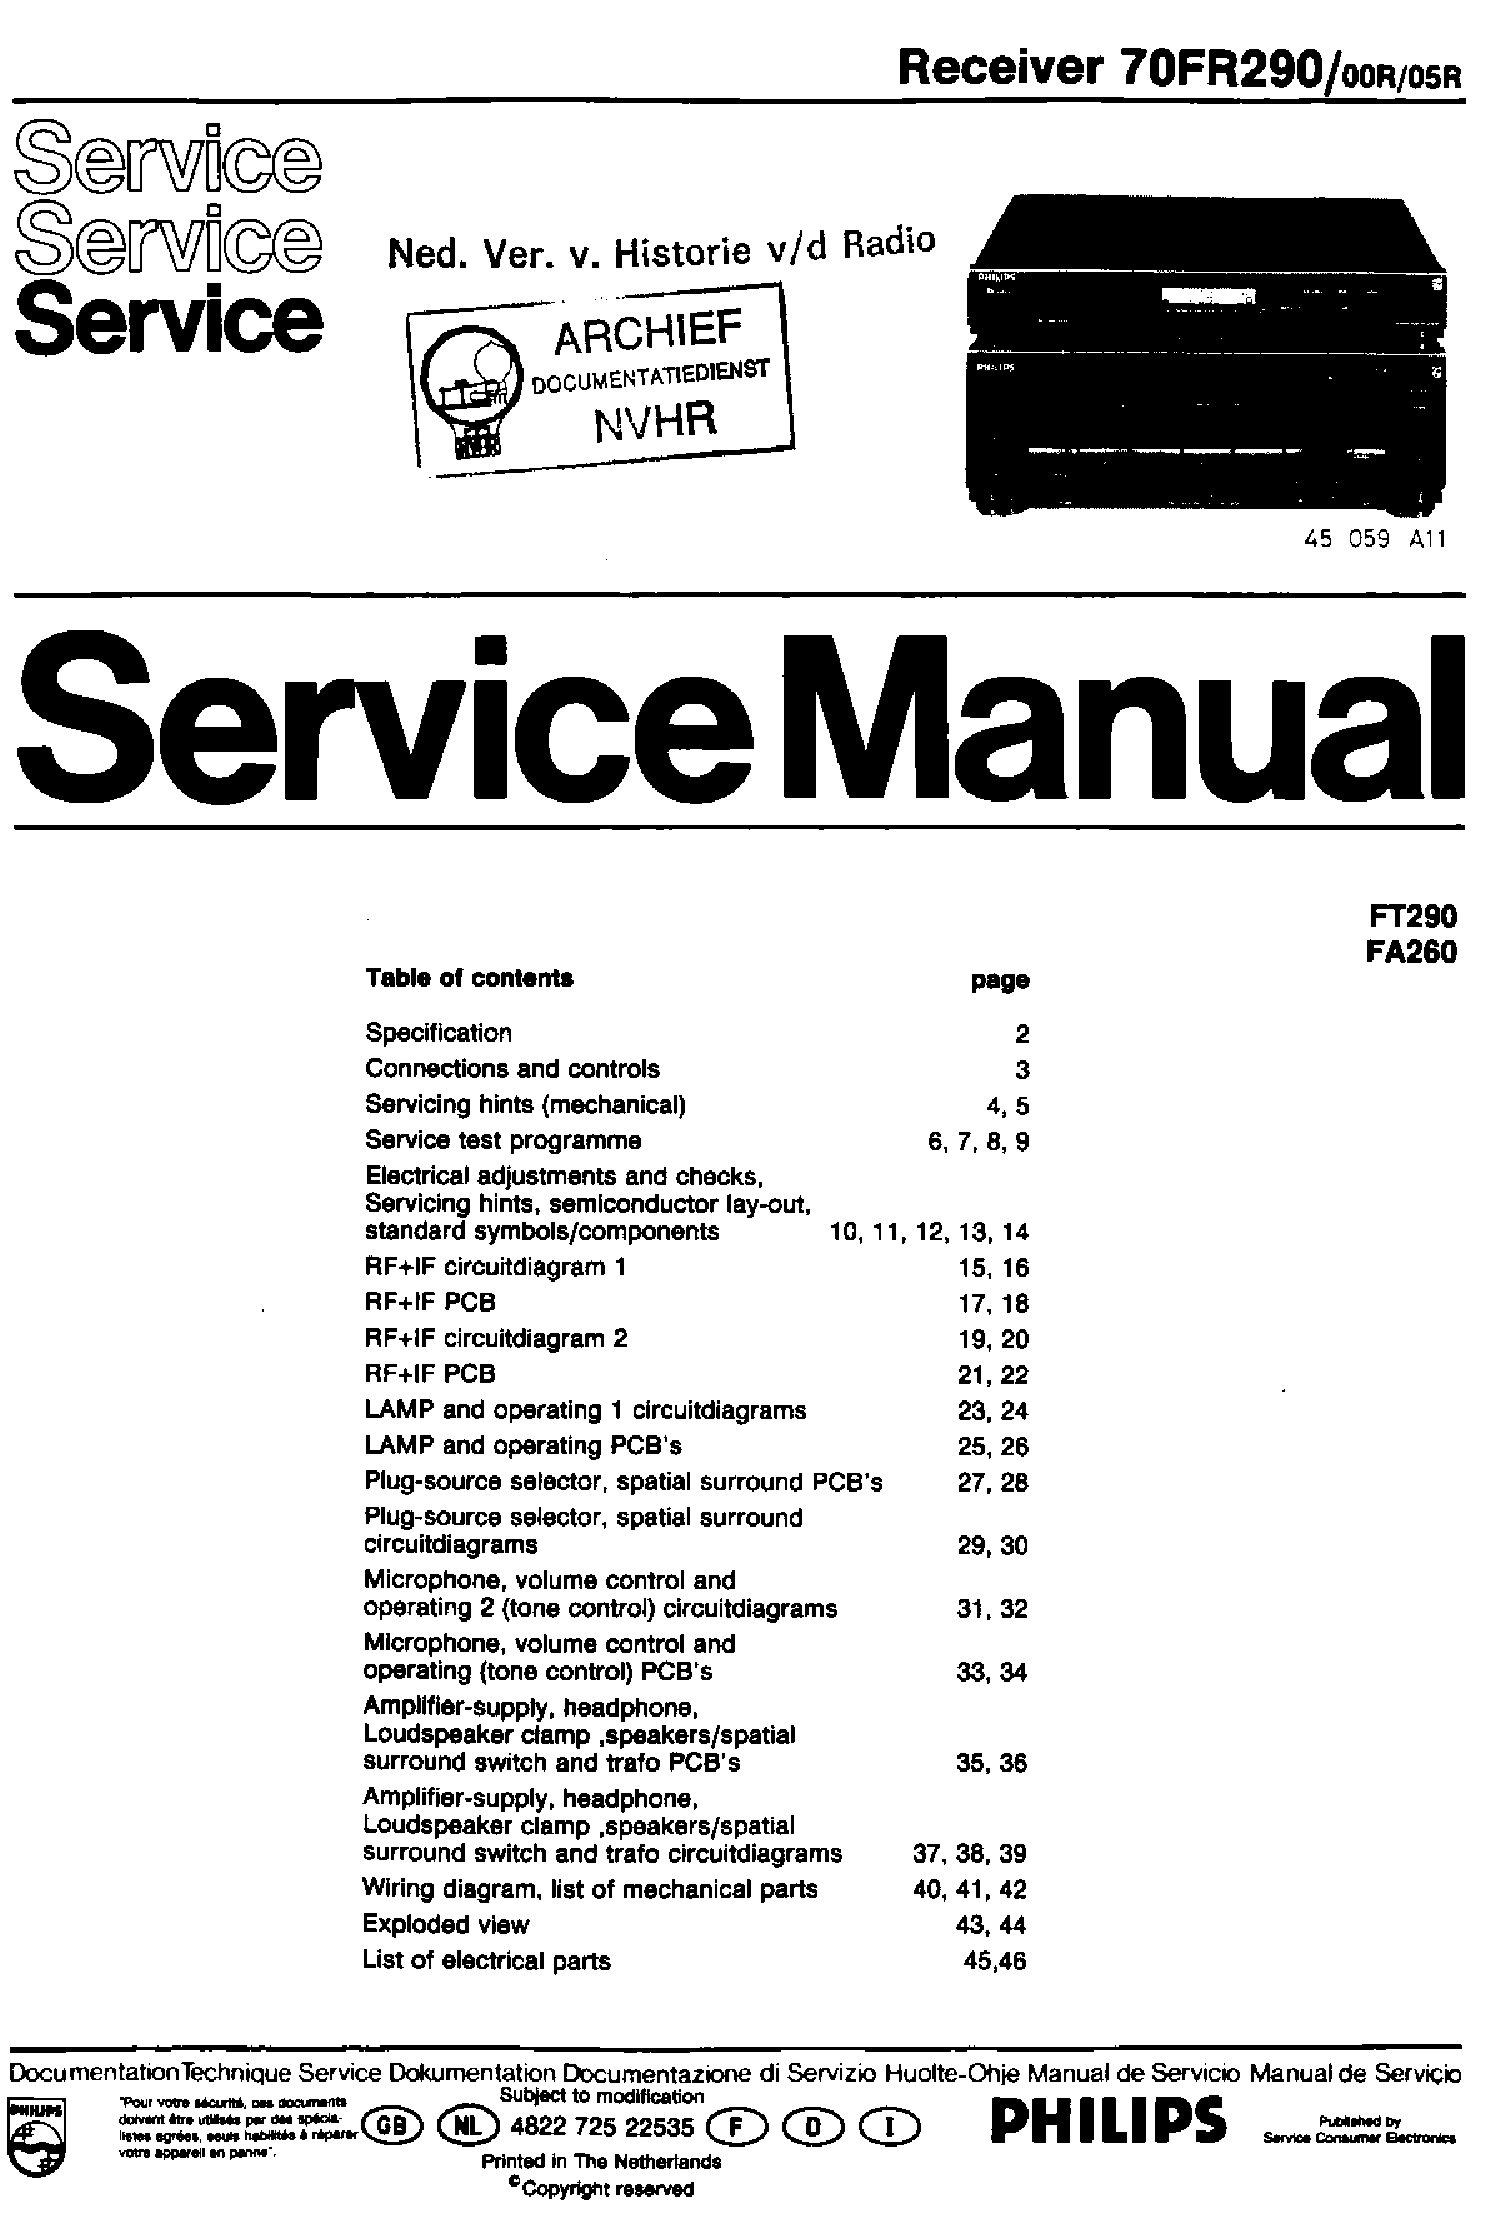 Philips 70fr290